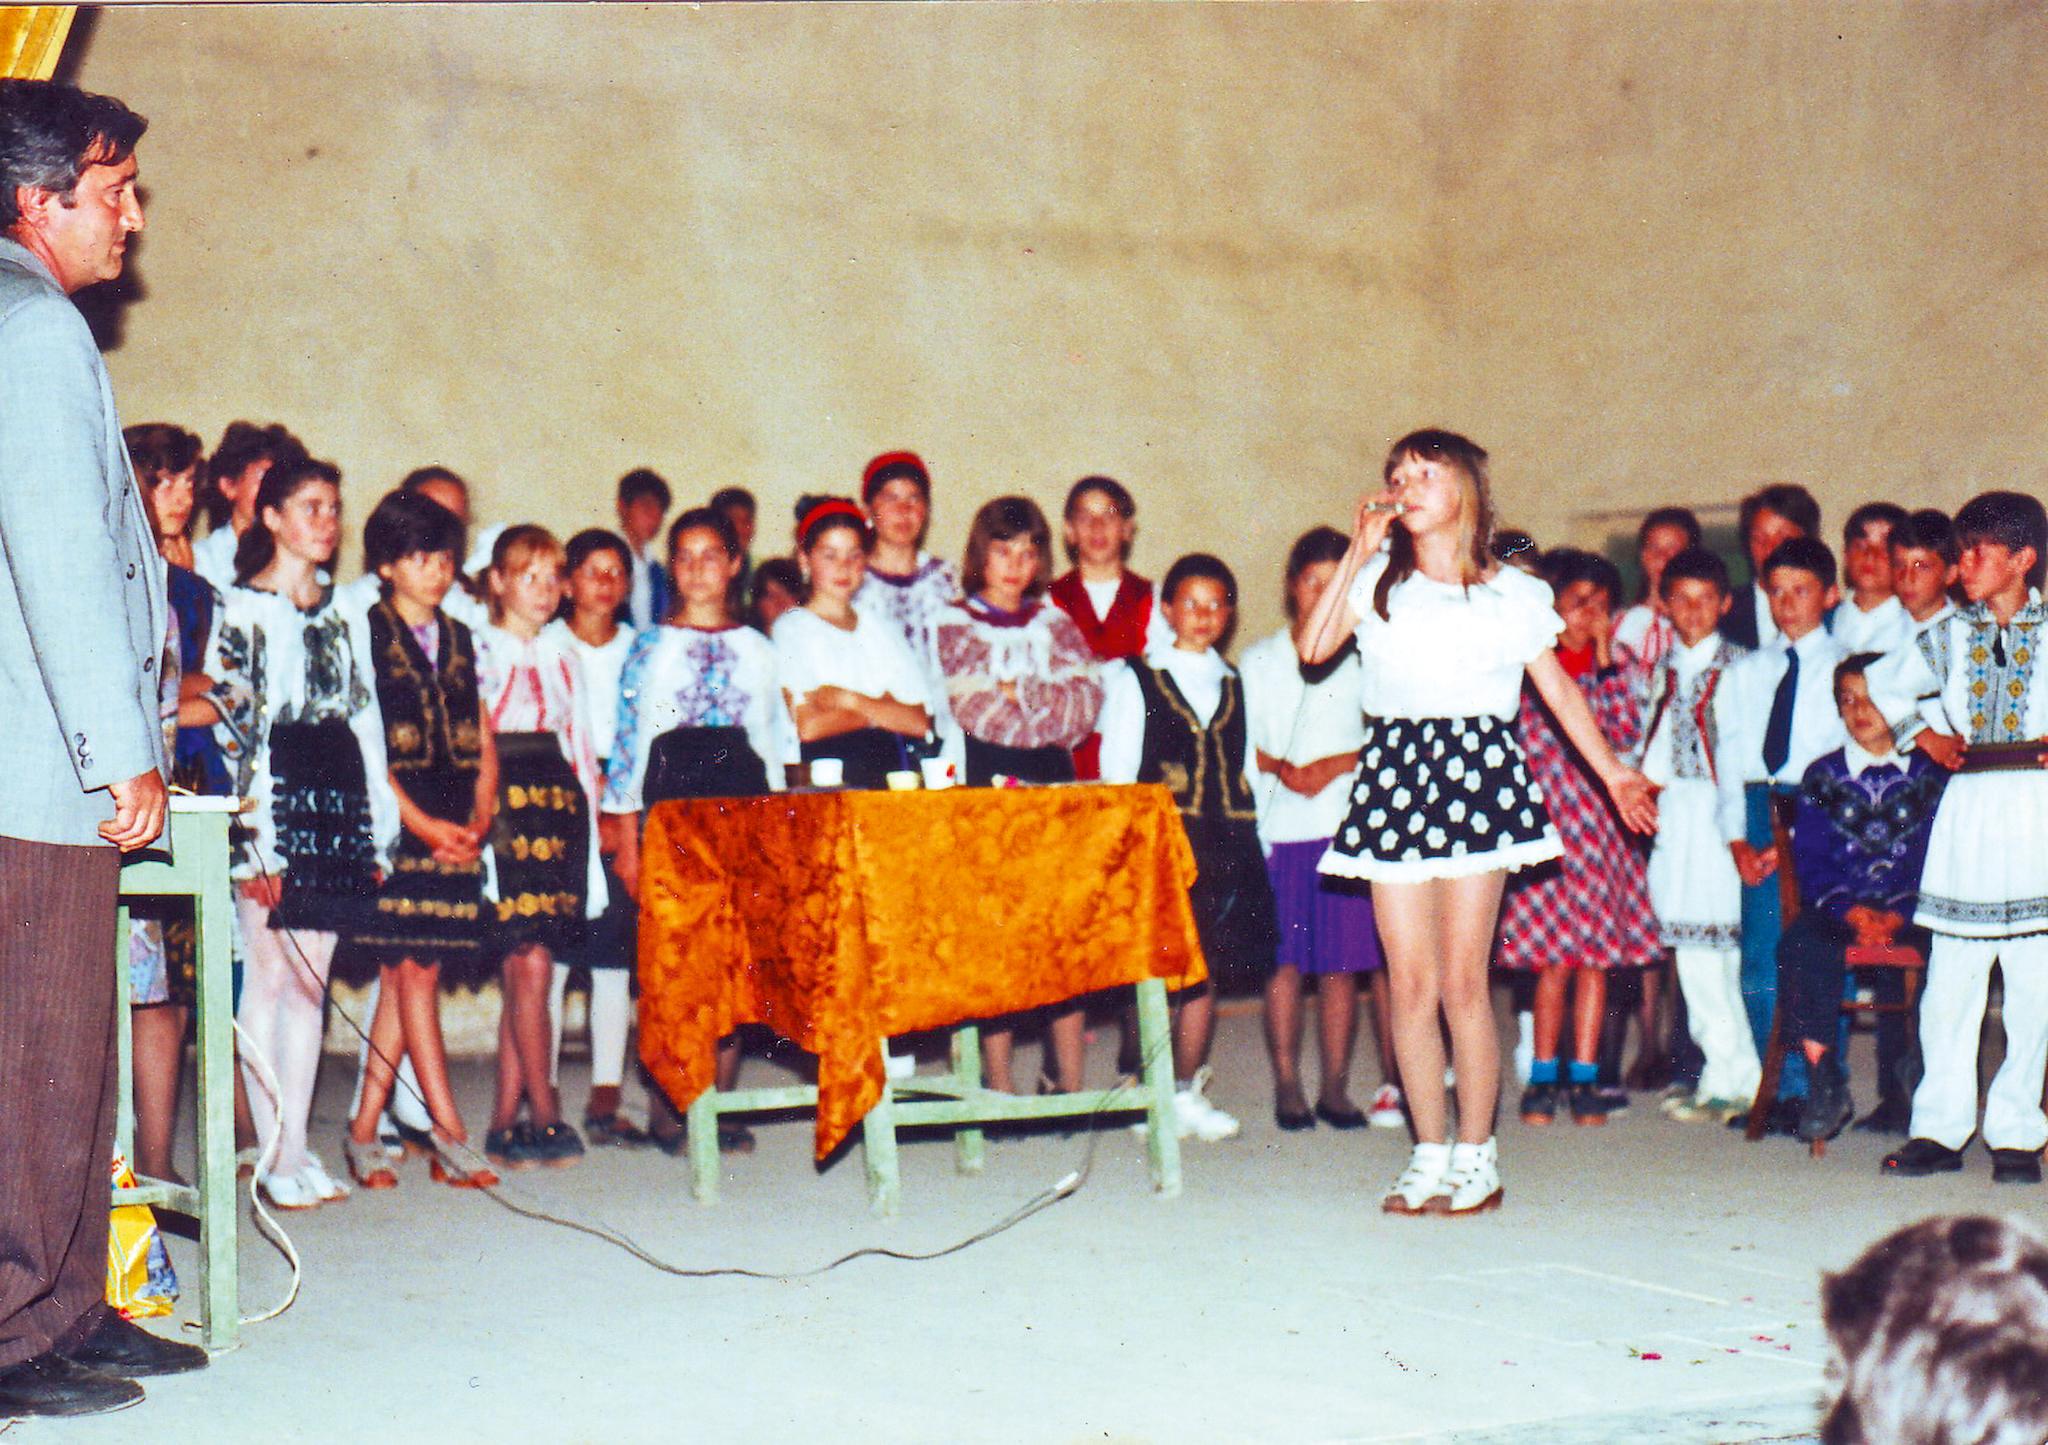 Adela a castigat primul premiu in muzica la varsta de 12 ani